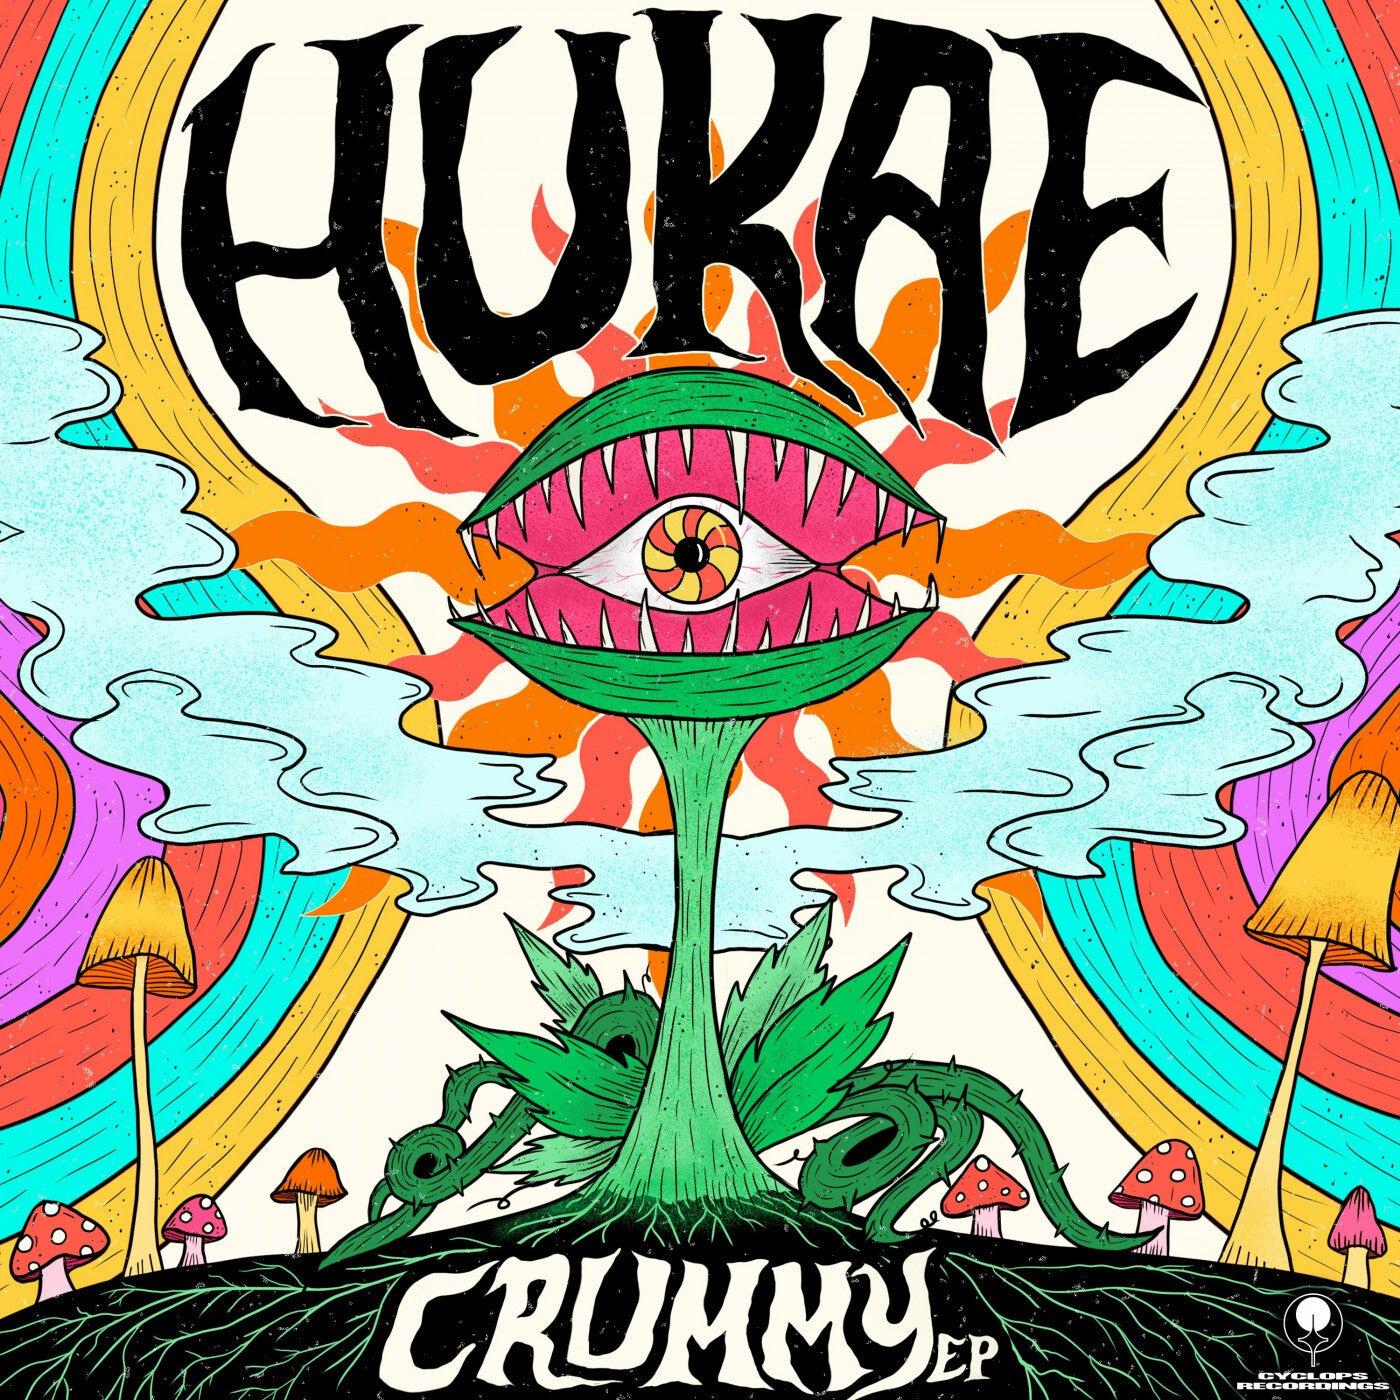 Crummy (Original Mix)